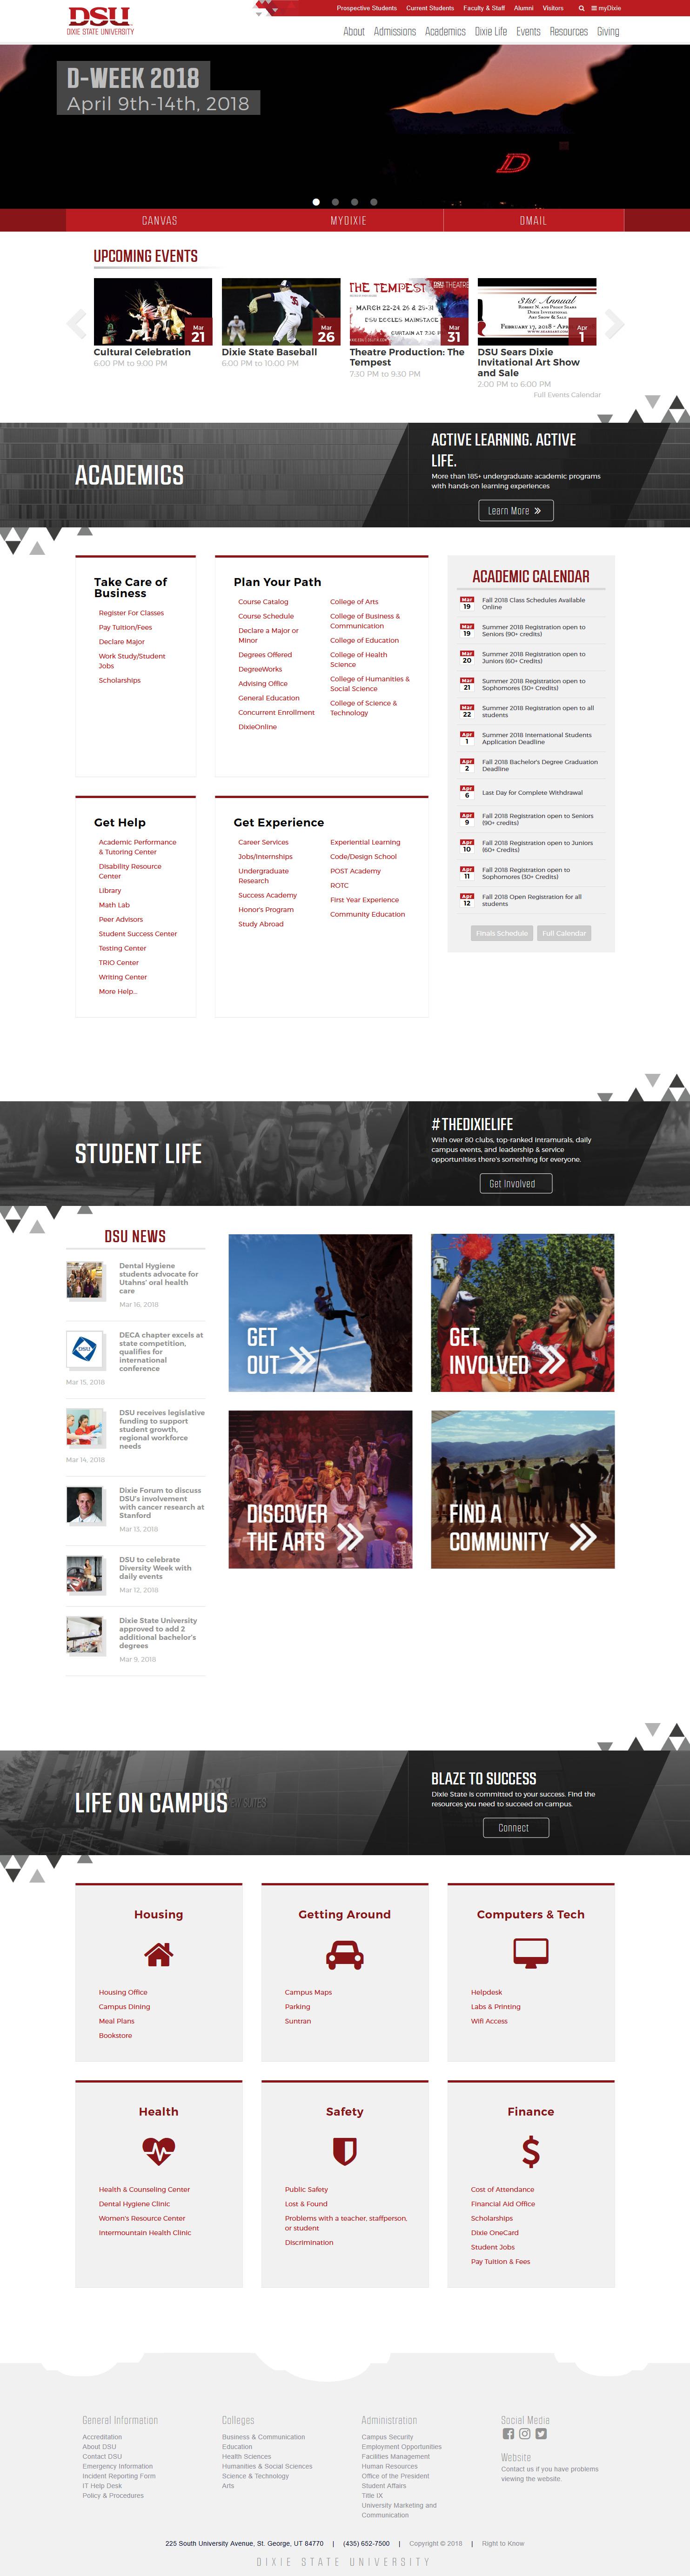 Student Portal, Desktop View